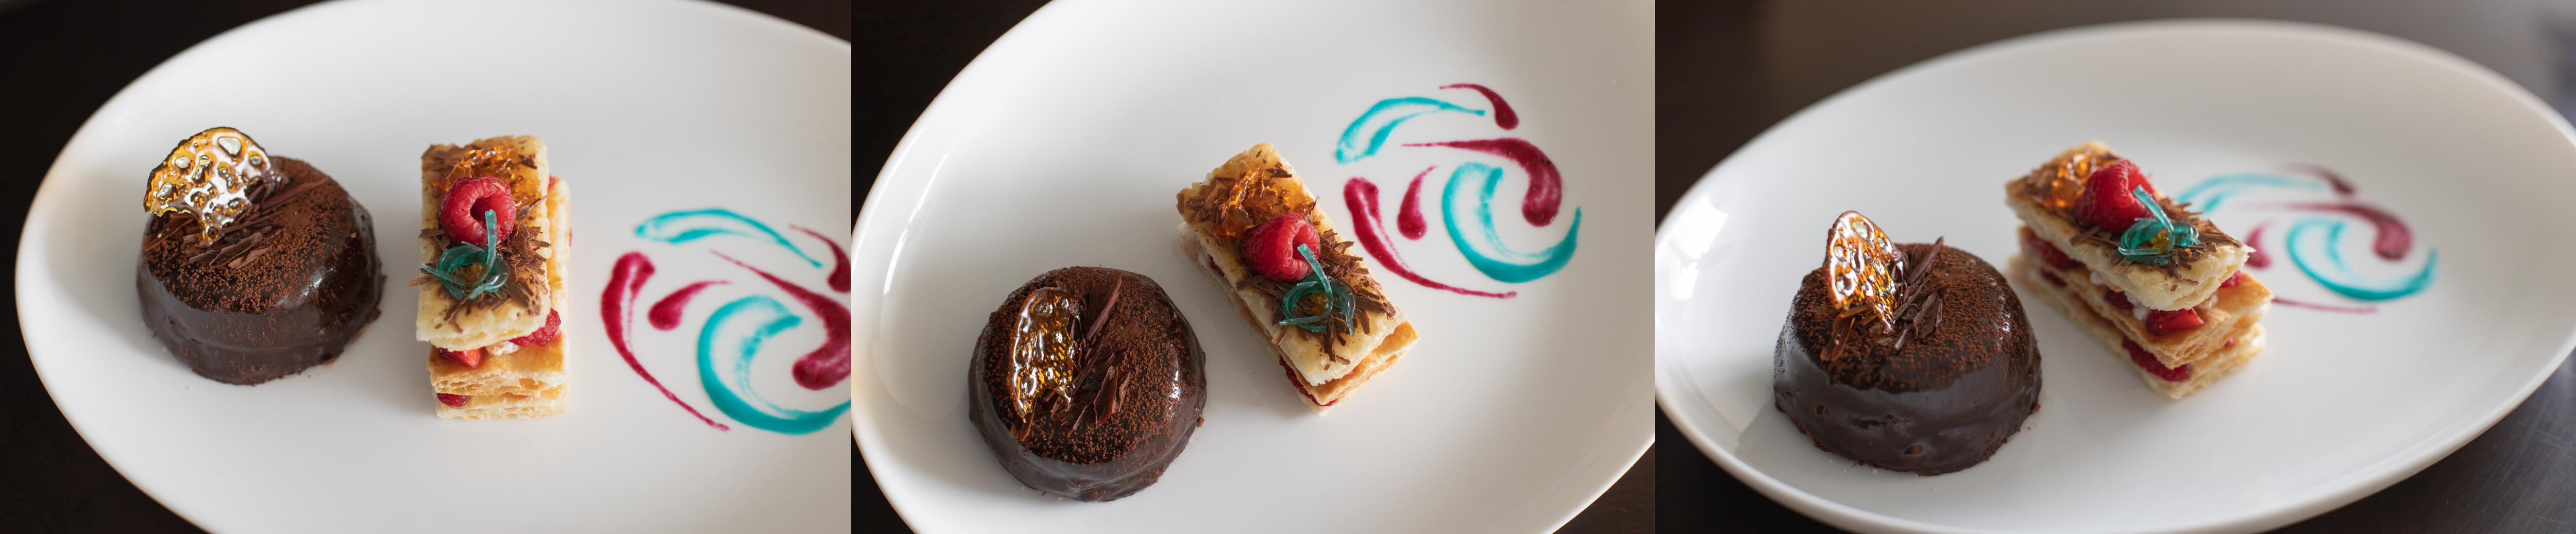 three pictures of my dessert